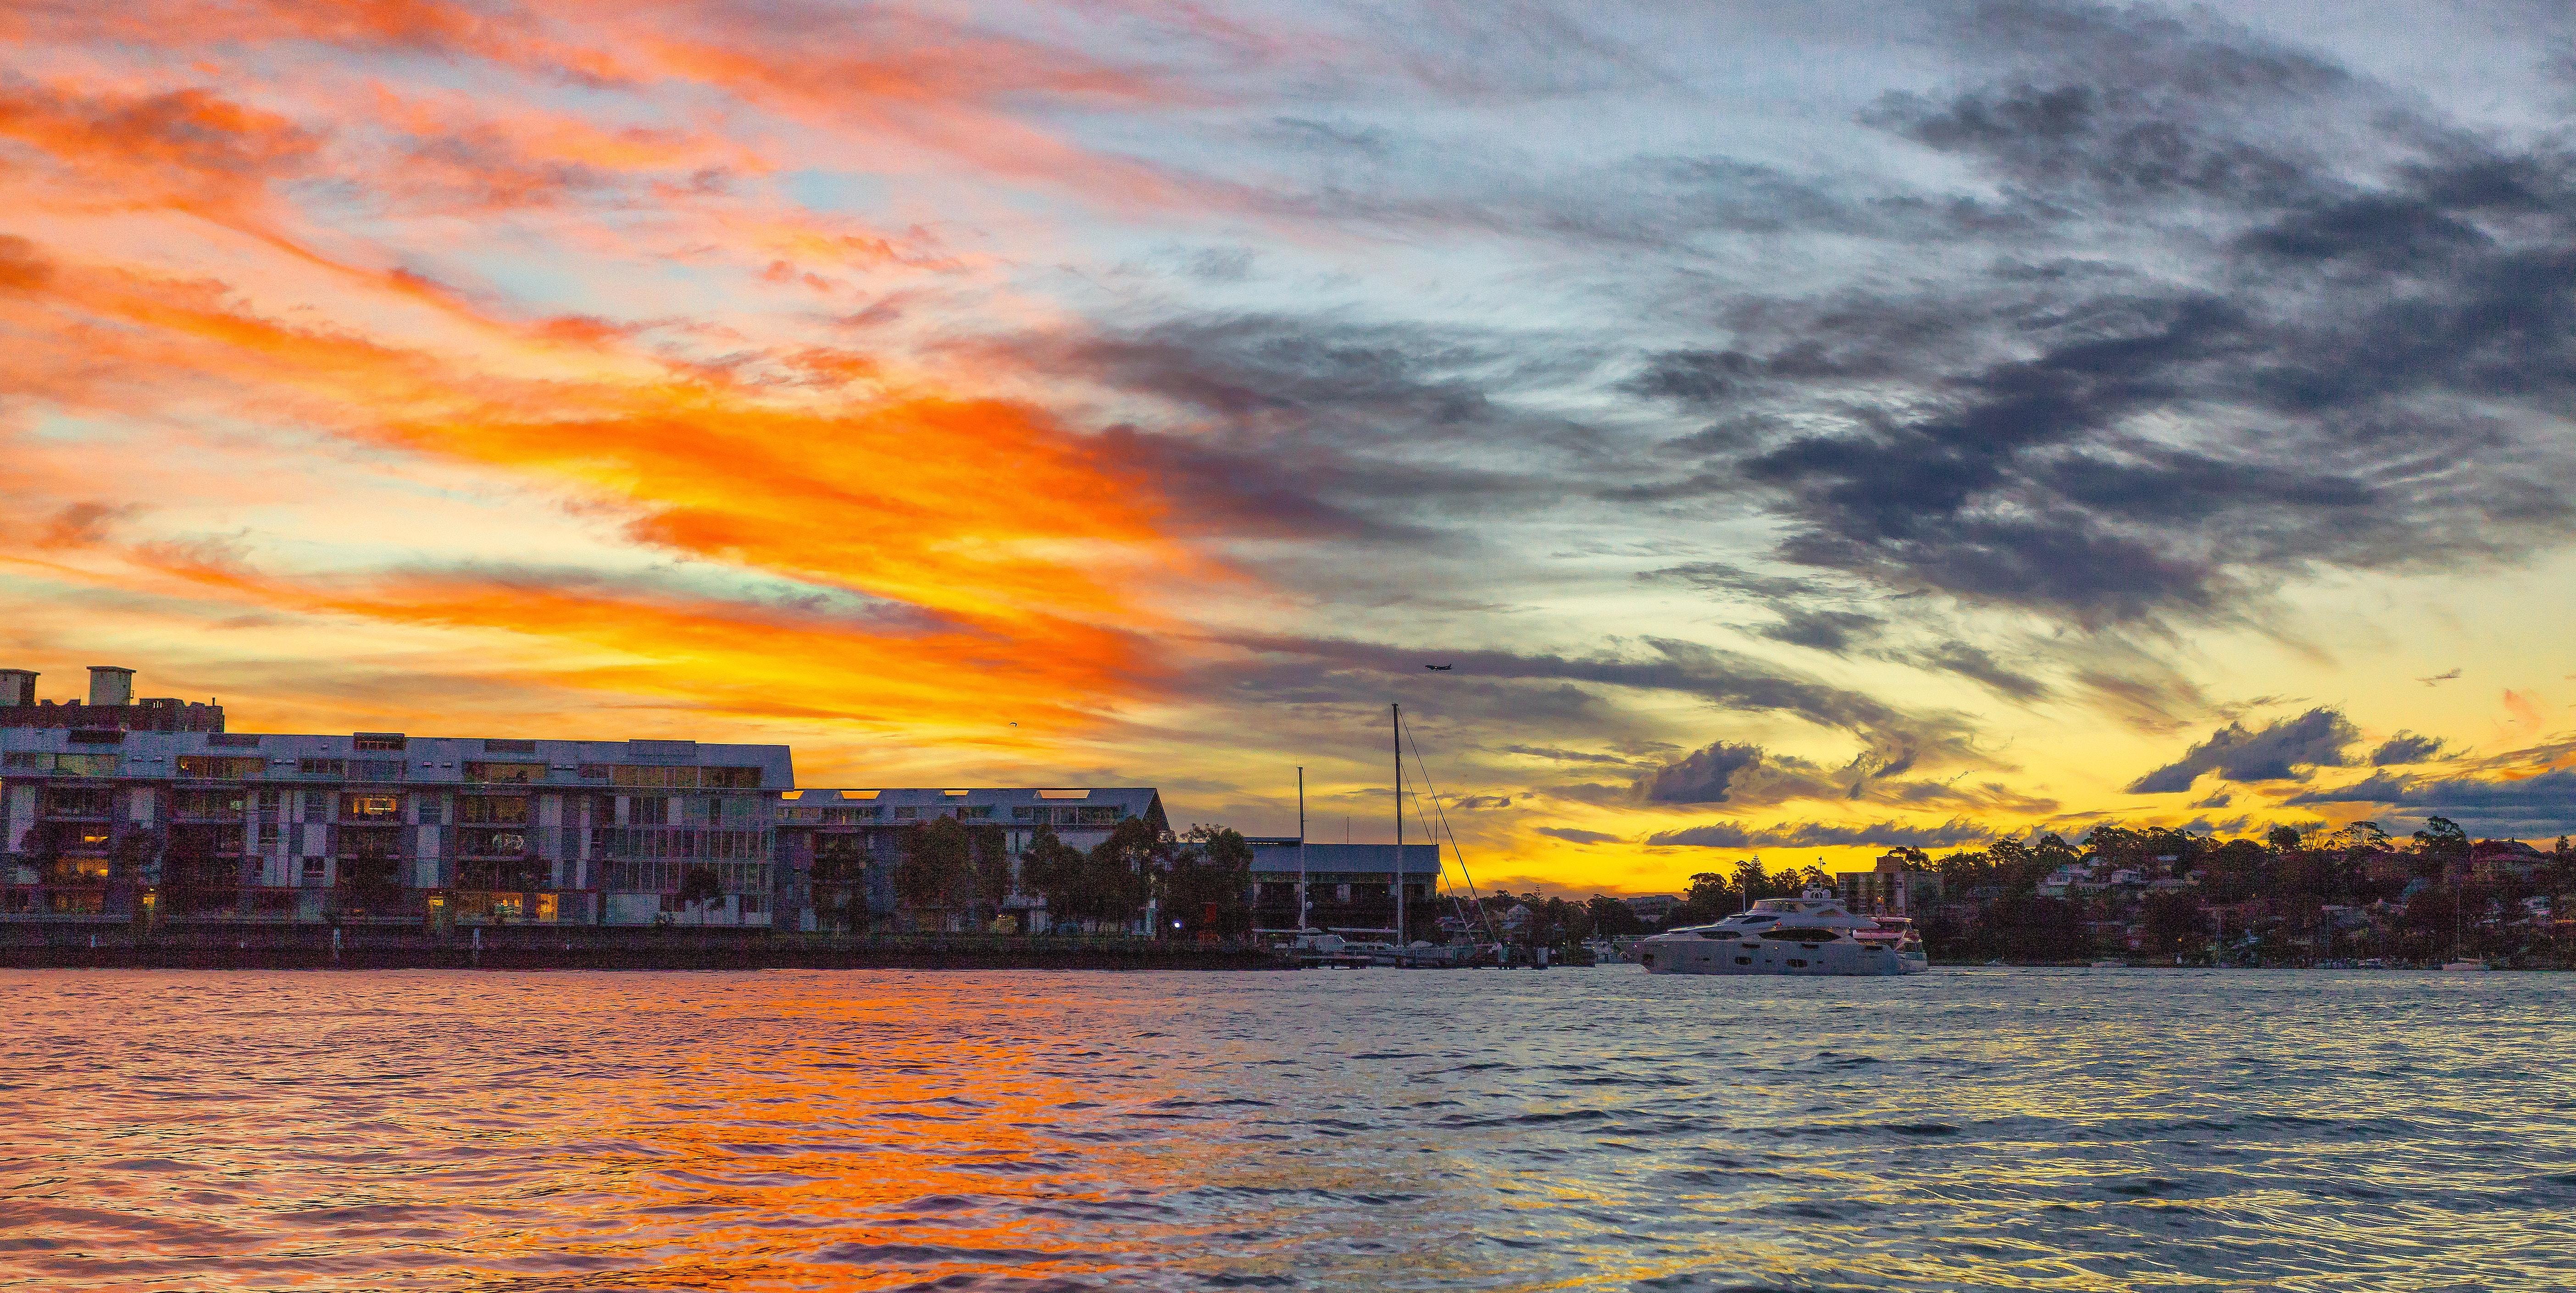 Sunset Photography, Architecture, Reflection, Watercraft, Water, HQ Photo